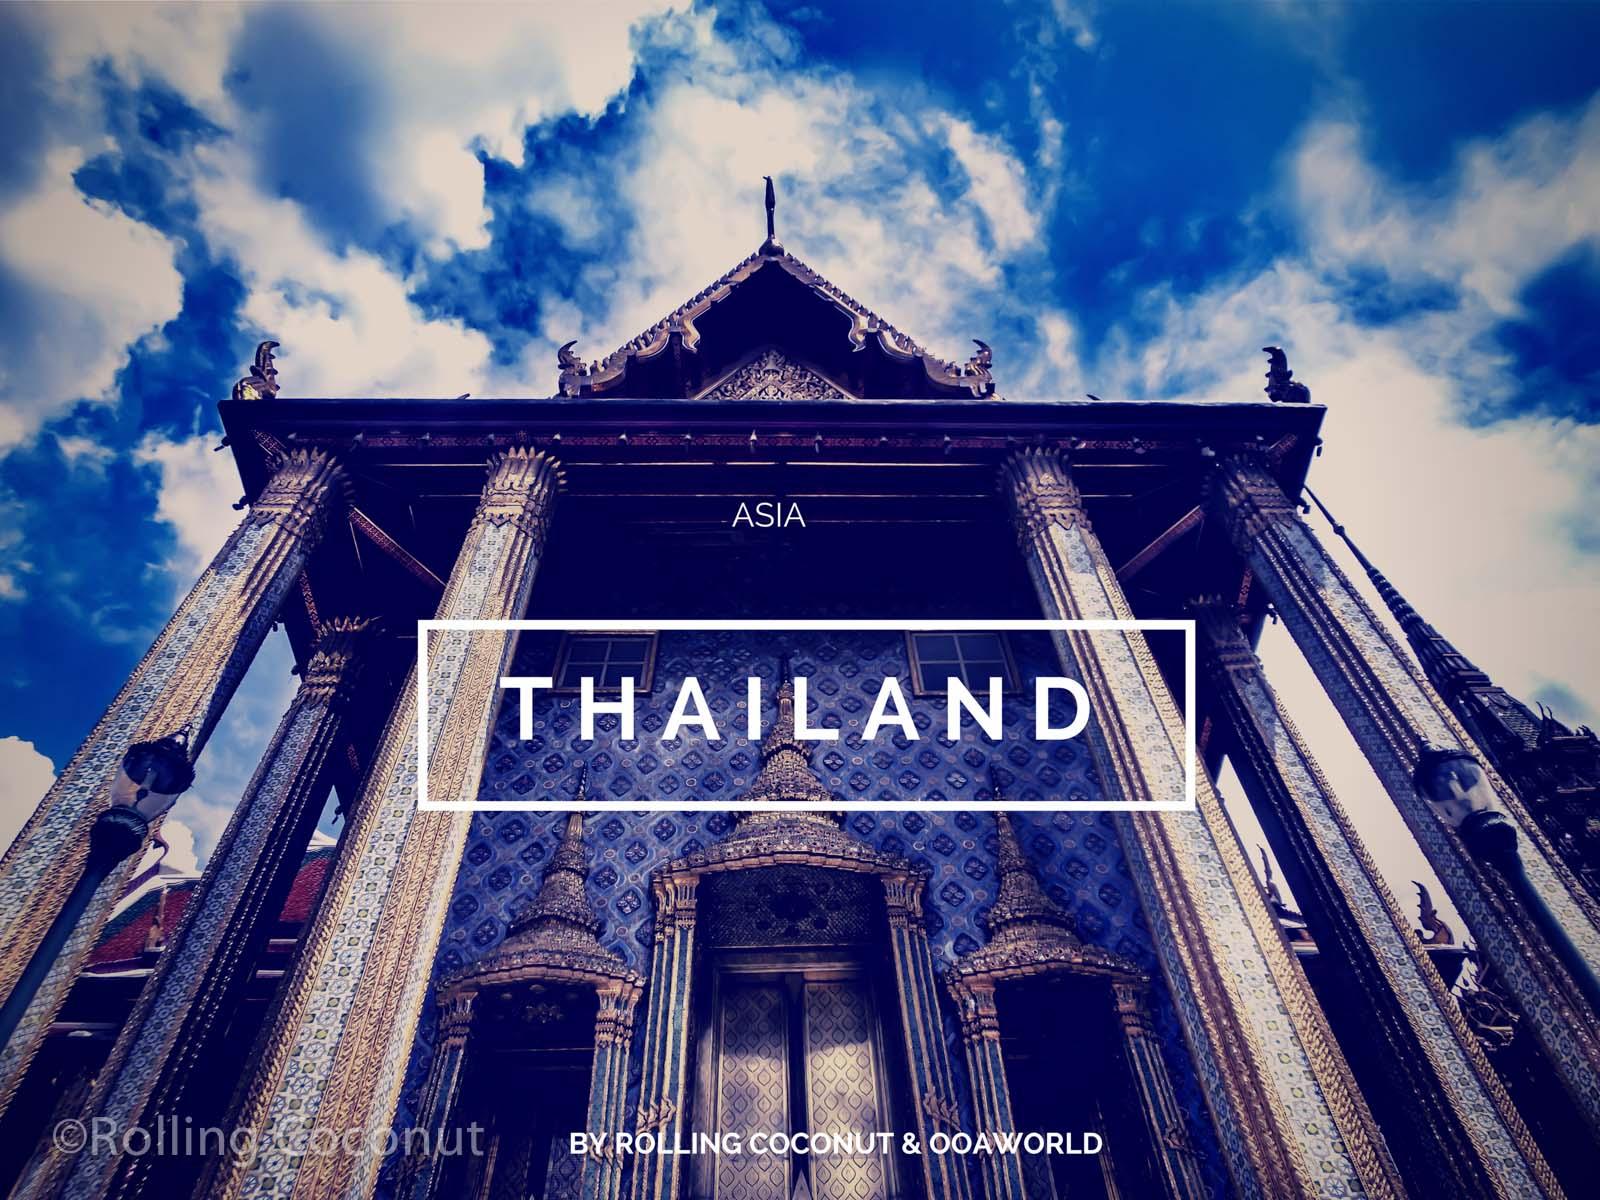 Thailand Travel Ooaworld Rolling Coconut Photo Ooaworld